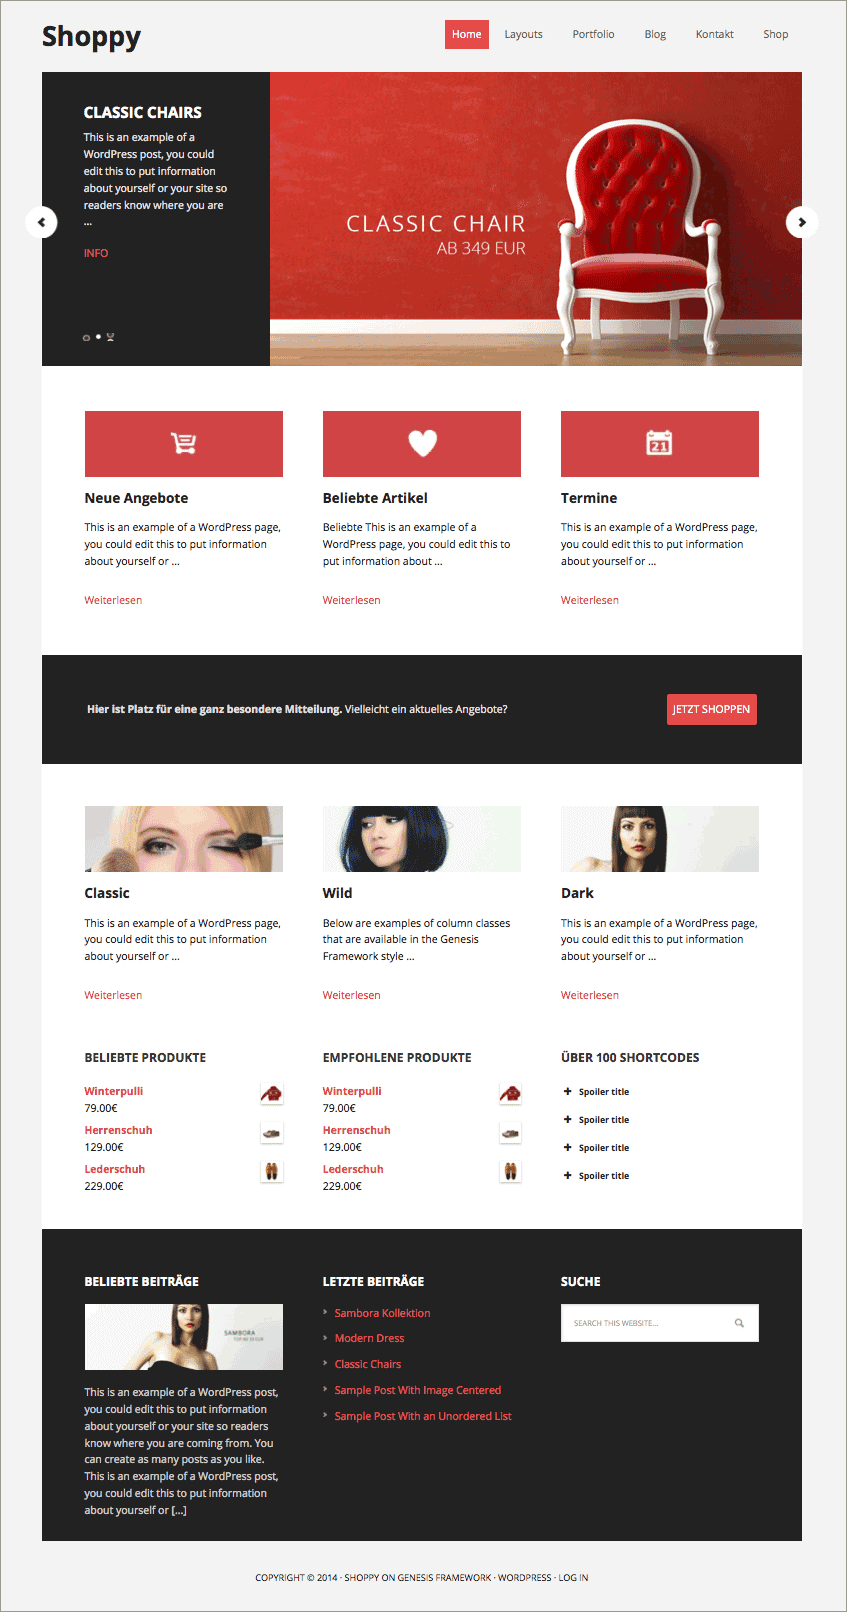 shoppy-screenshot